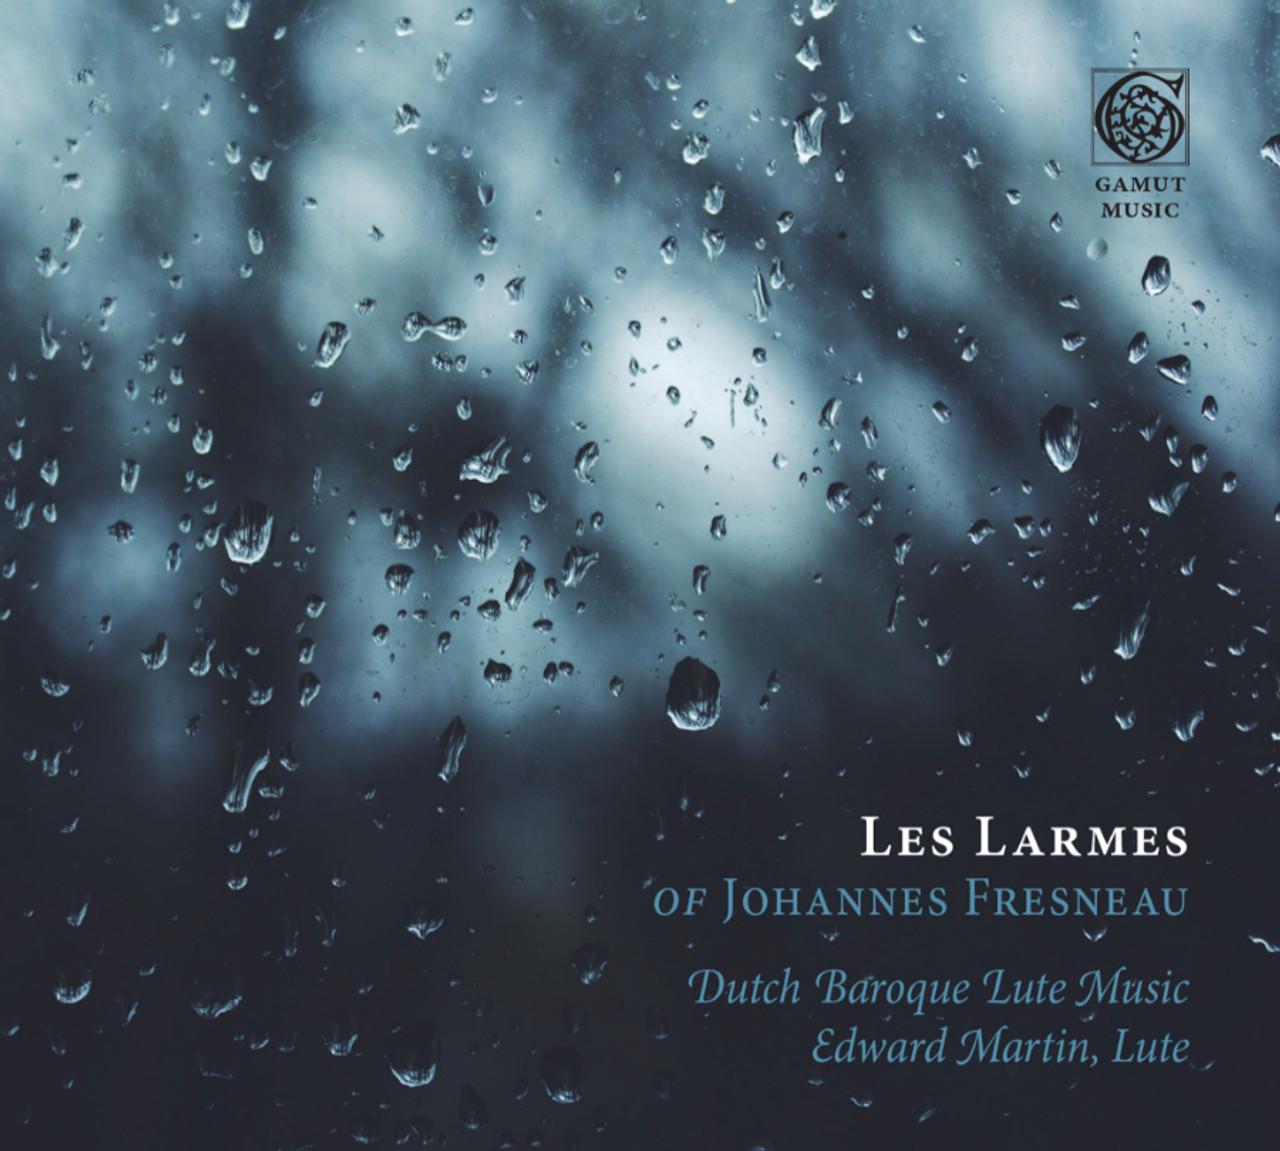 Les Larmes of Johannes Fresneau Digital Download